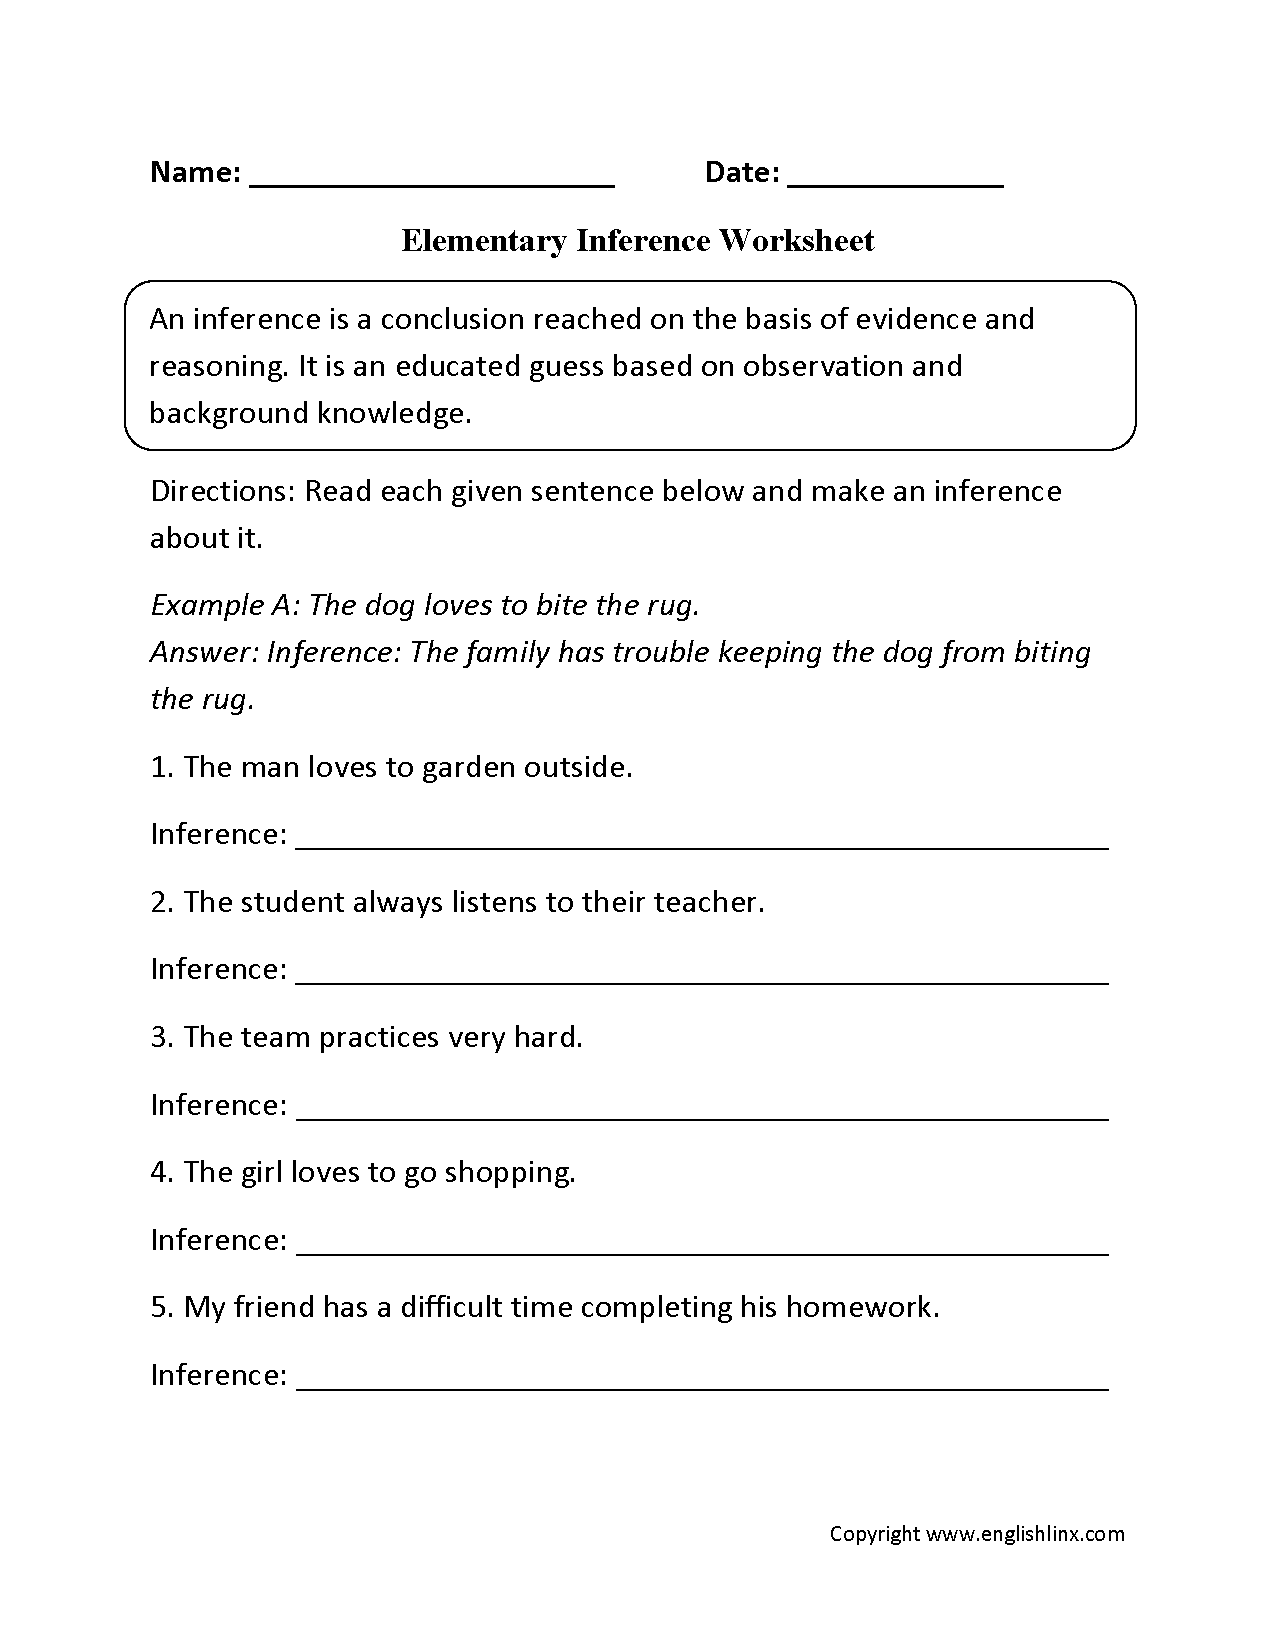 Inferencing Worksheets For 4th Grade The Best Worksheets Image